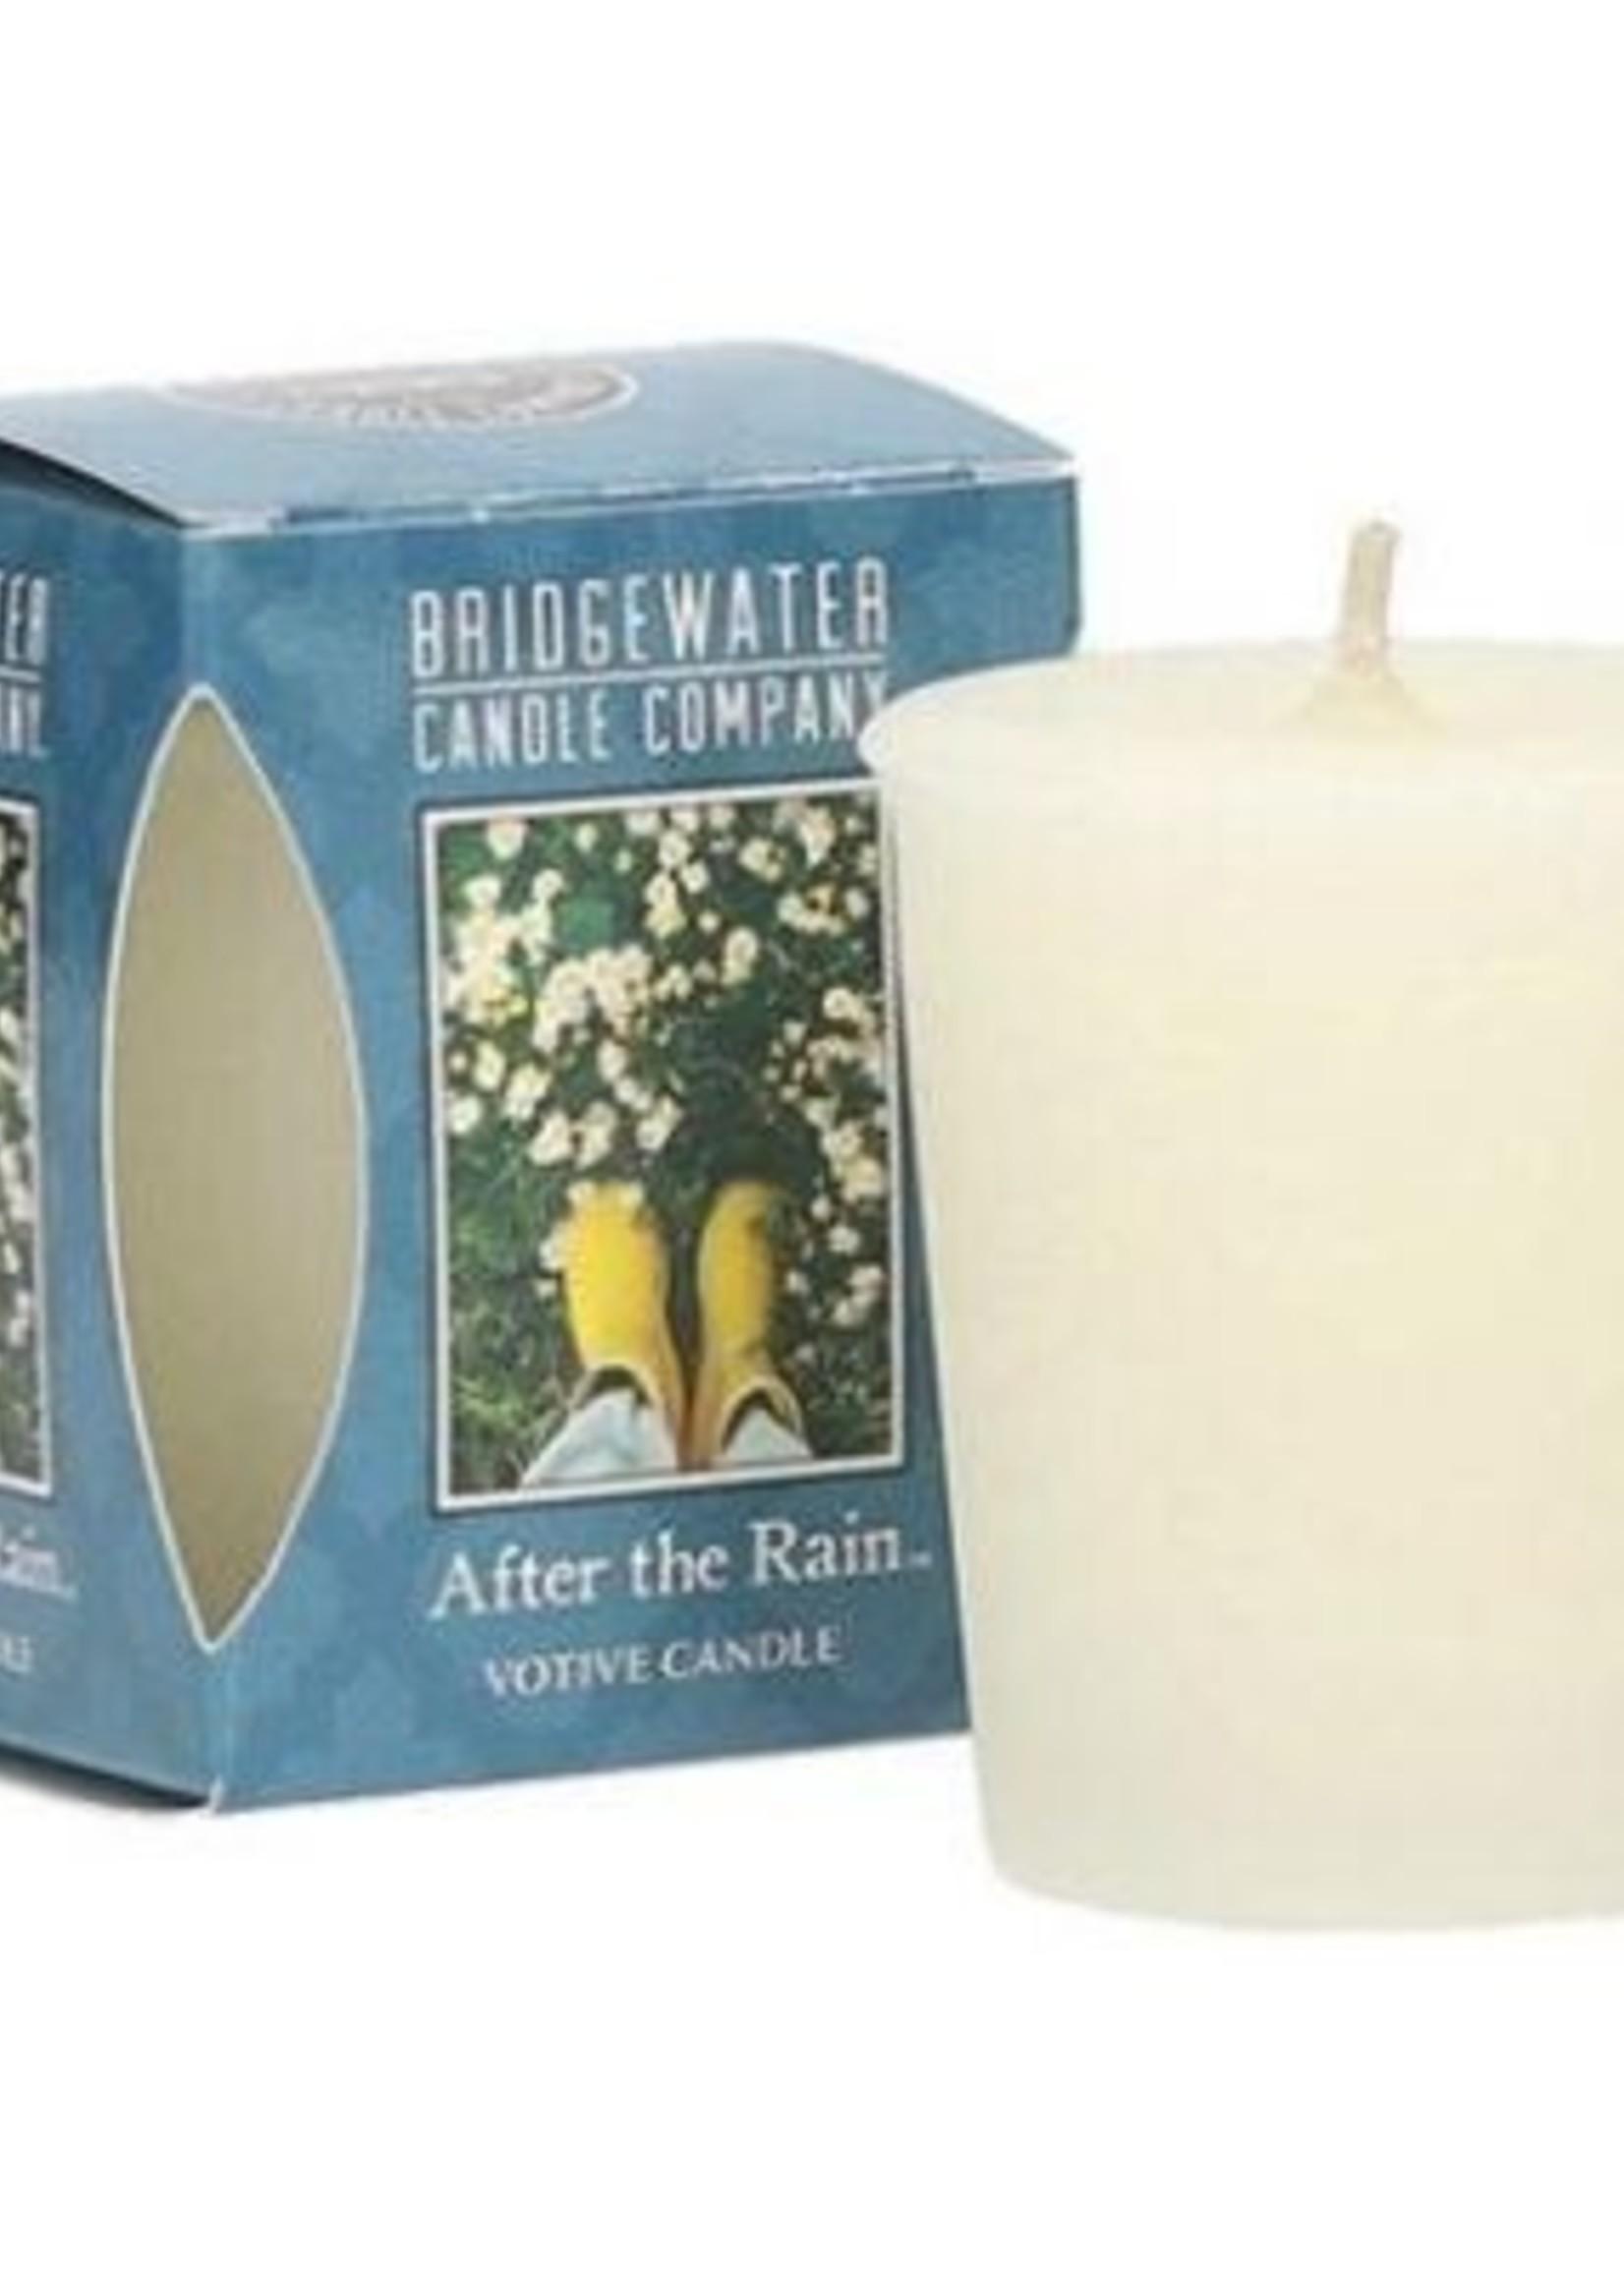 Bridgewater Votive Candle After the Rain